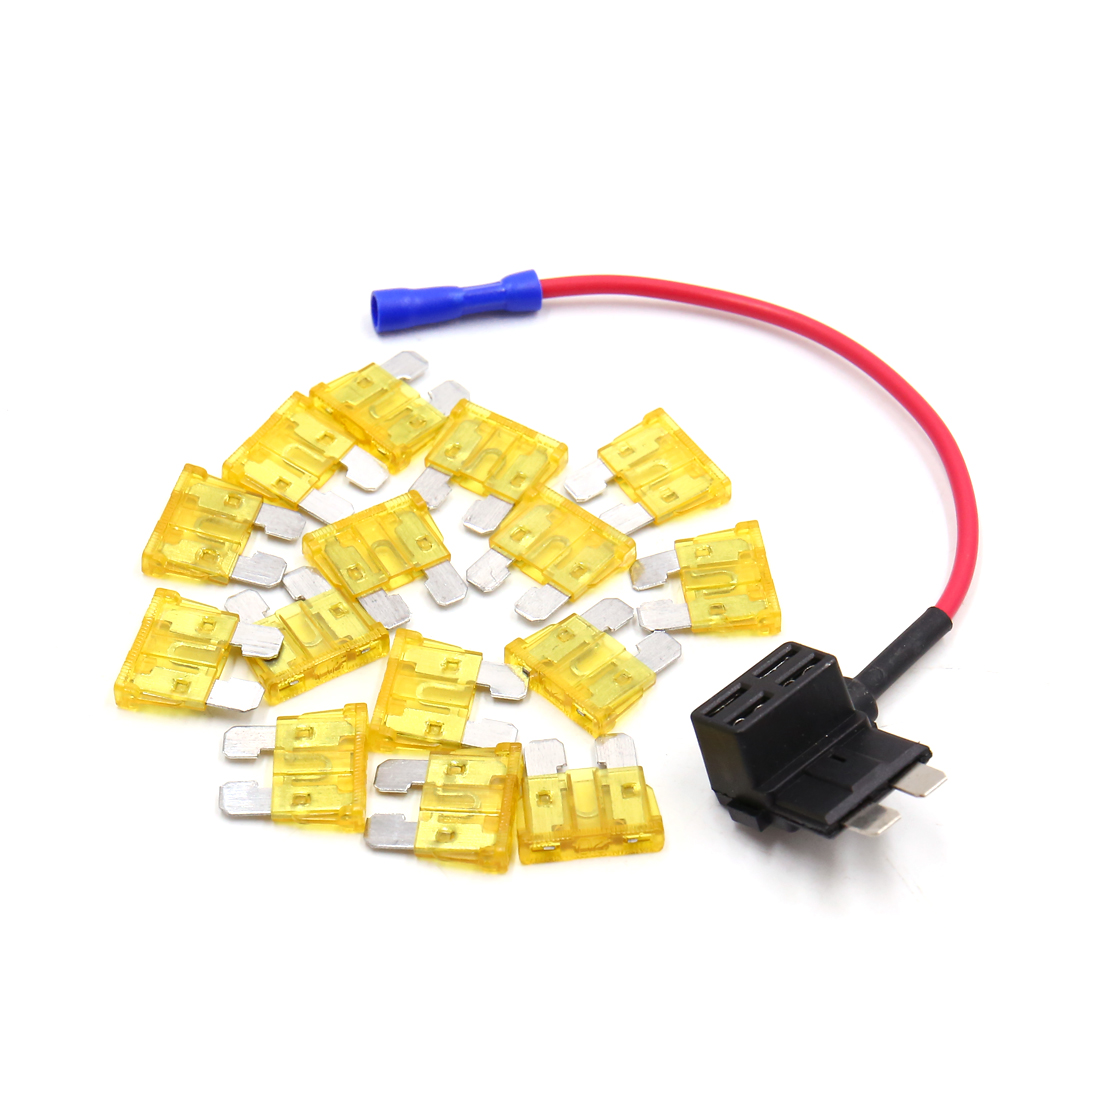 Car Add A Circuit Standard 20a Atc Ato Regular Blade Style Fuse Addacircuit Holder Tap